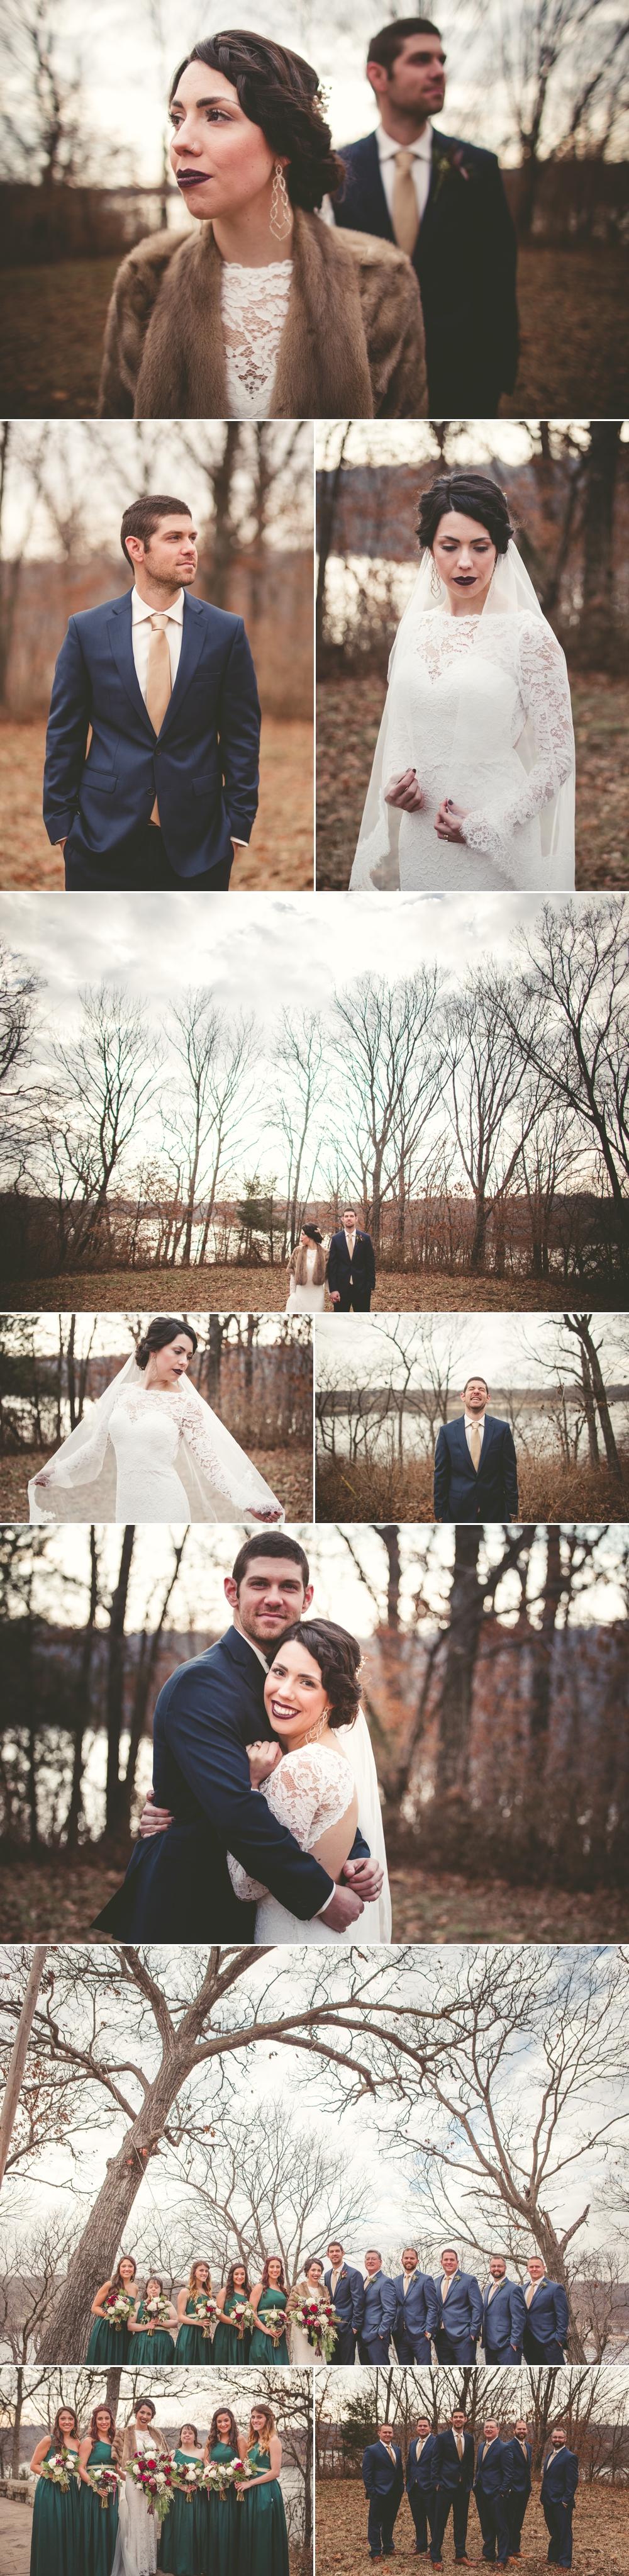 jason_domingues_photography_best_kansas_city_photographer_wedding_kc_weddings_james_p_davis_hall_0004.jpg